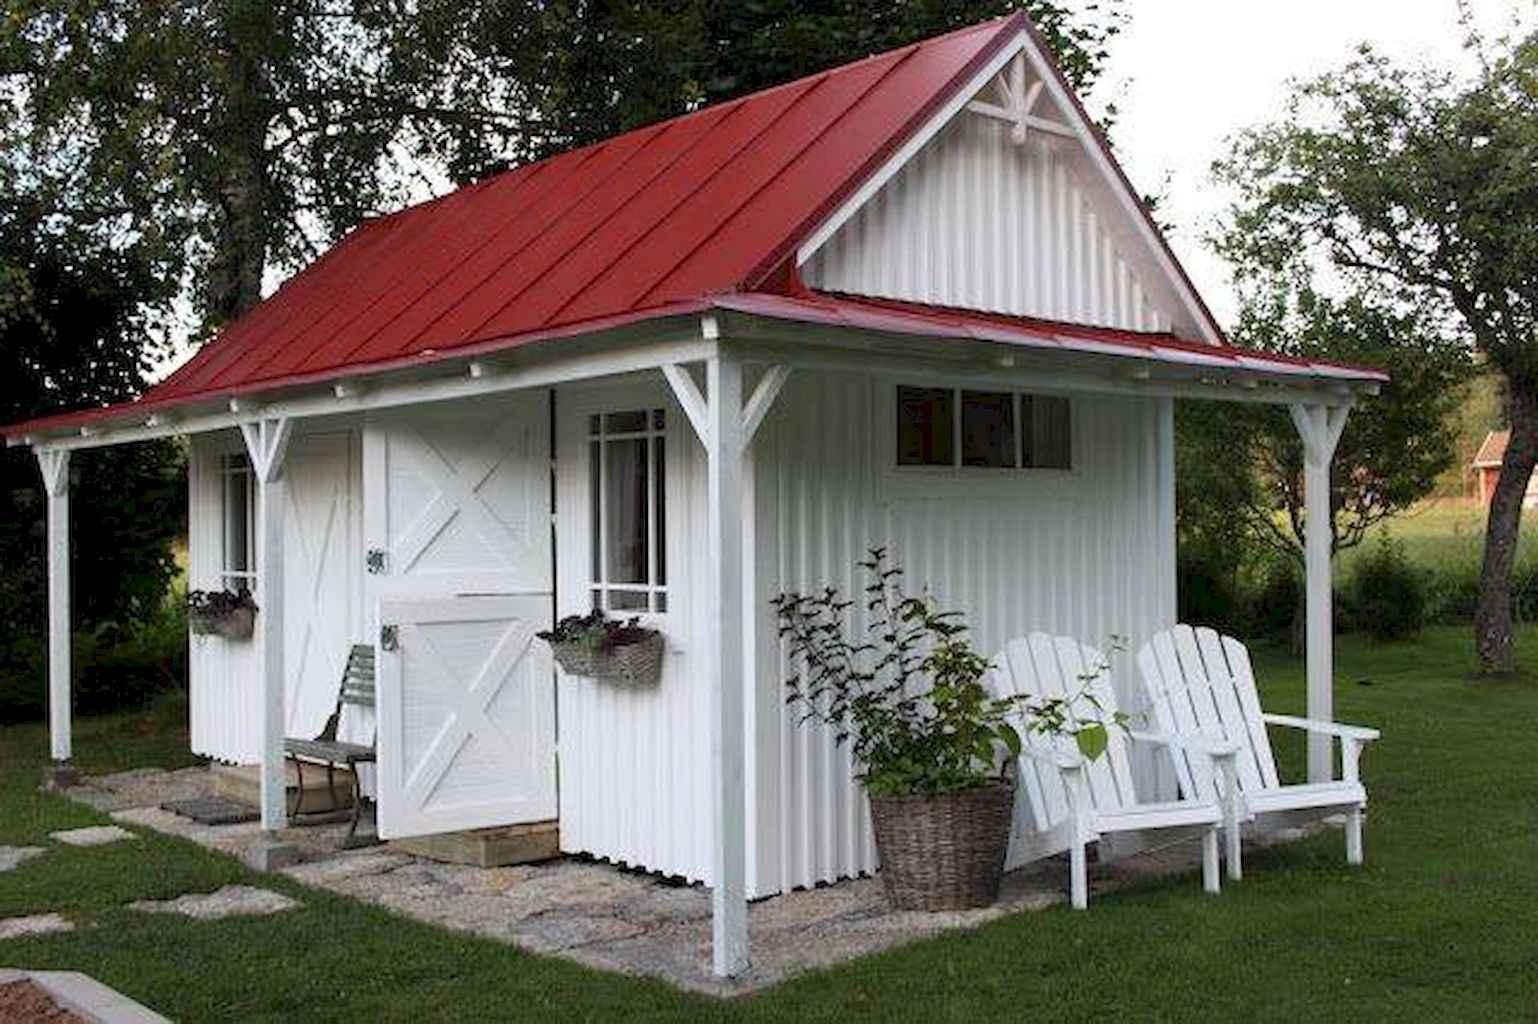 Cool diy backyard studio shed remodel design & decor ideas (2)